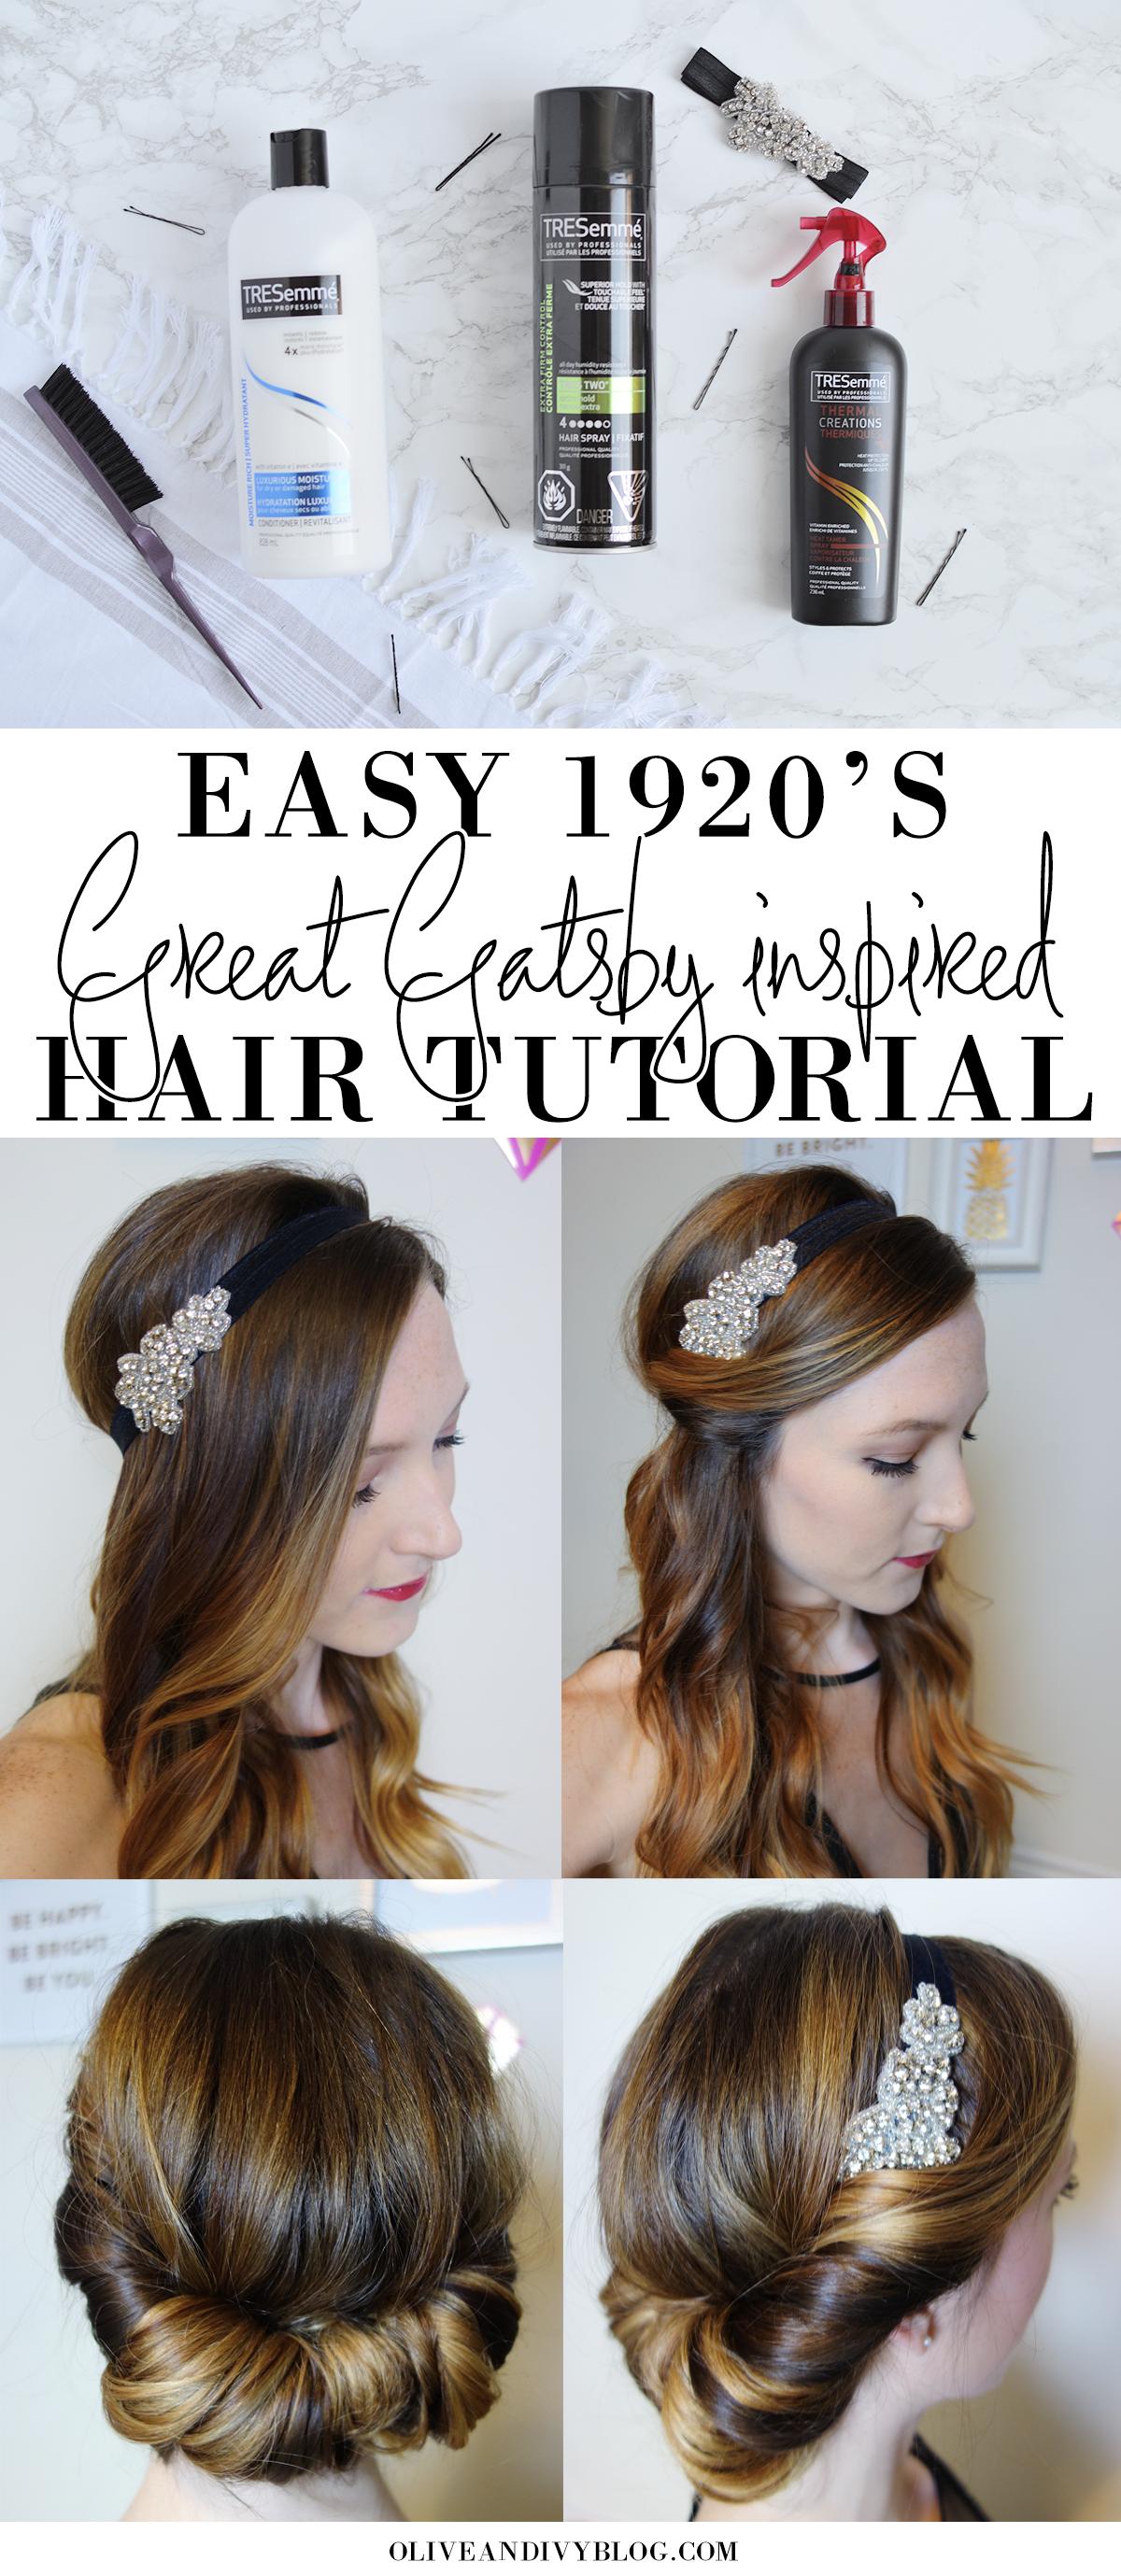 easy 1920's/great gatsby hair tutorial | 1920s | gatsby hair